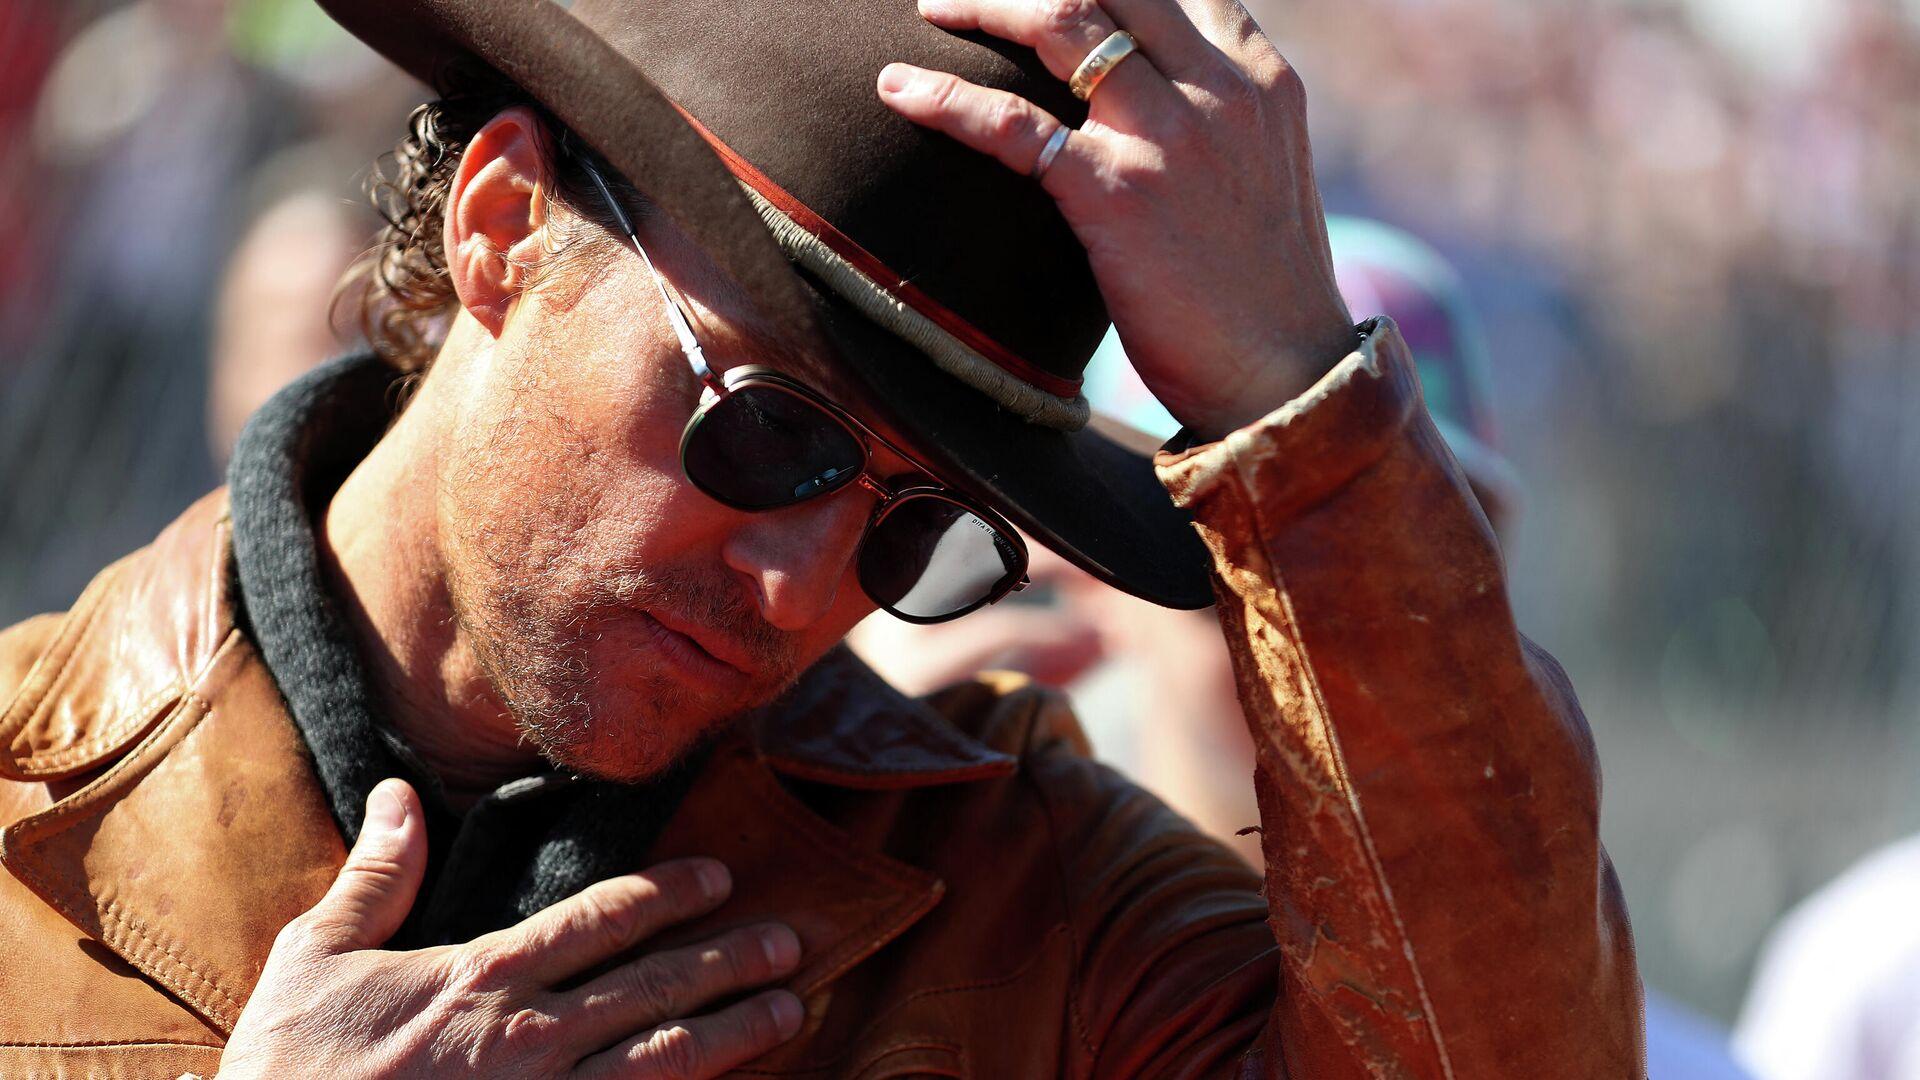 Matthew McConaughey, actor estadounidense - Sputnik Mundo, 1920, 13.03.2021